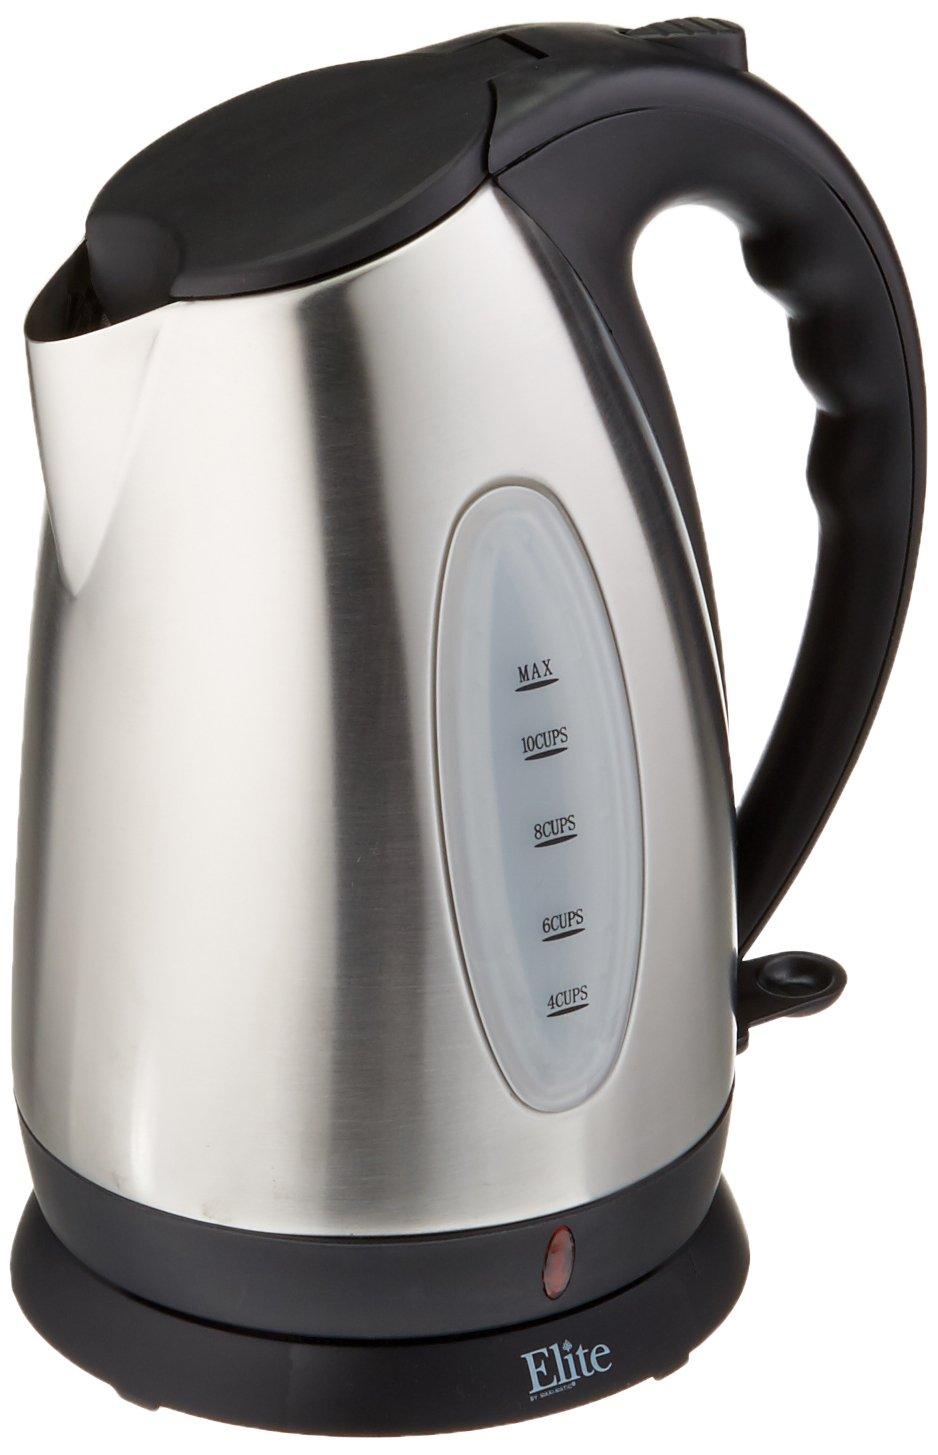 Elite Platinum EKT-1271 1.7-Liter Cordless Electric Water Tea Kettle, Stainless Steel BPA Free